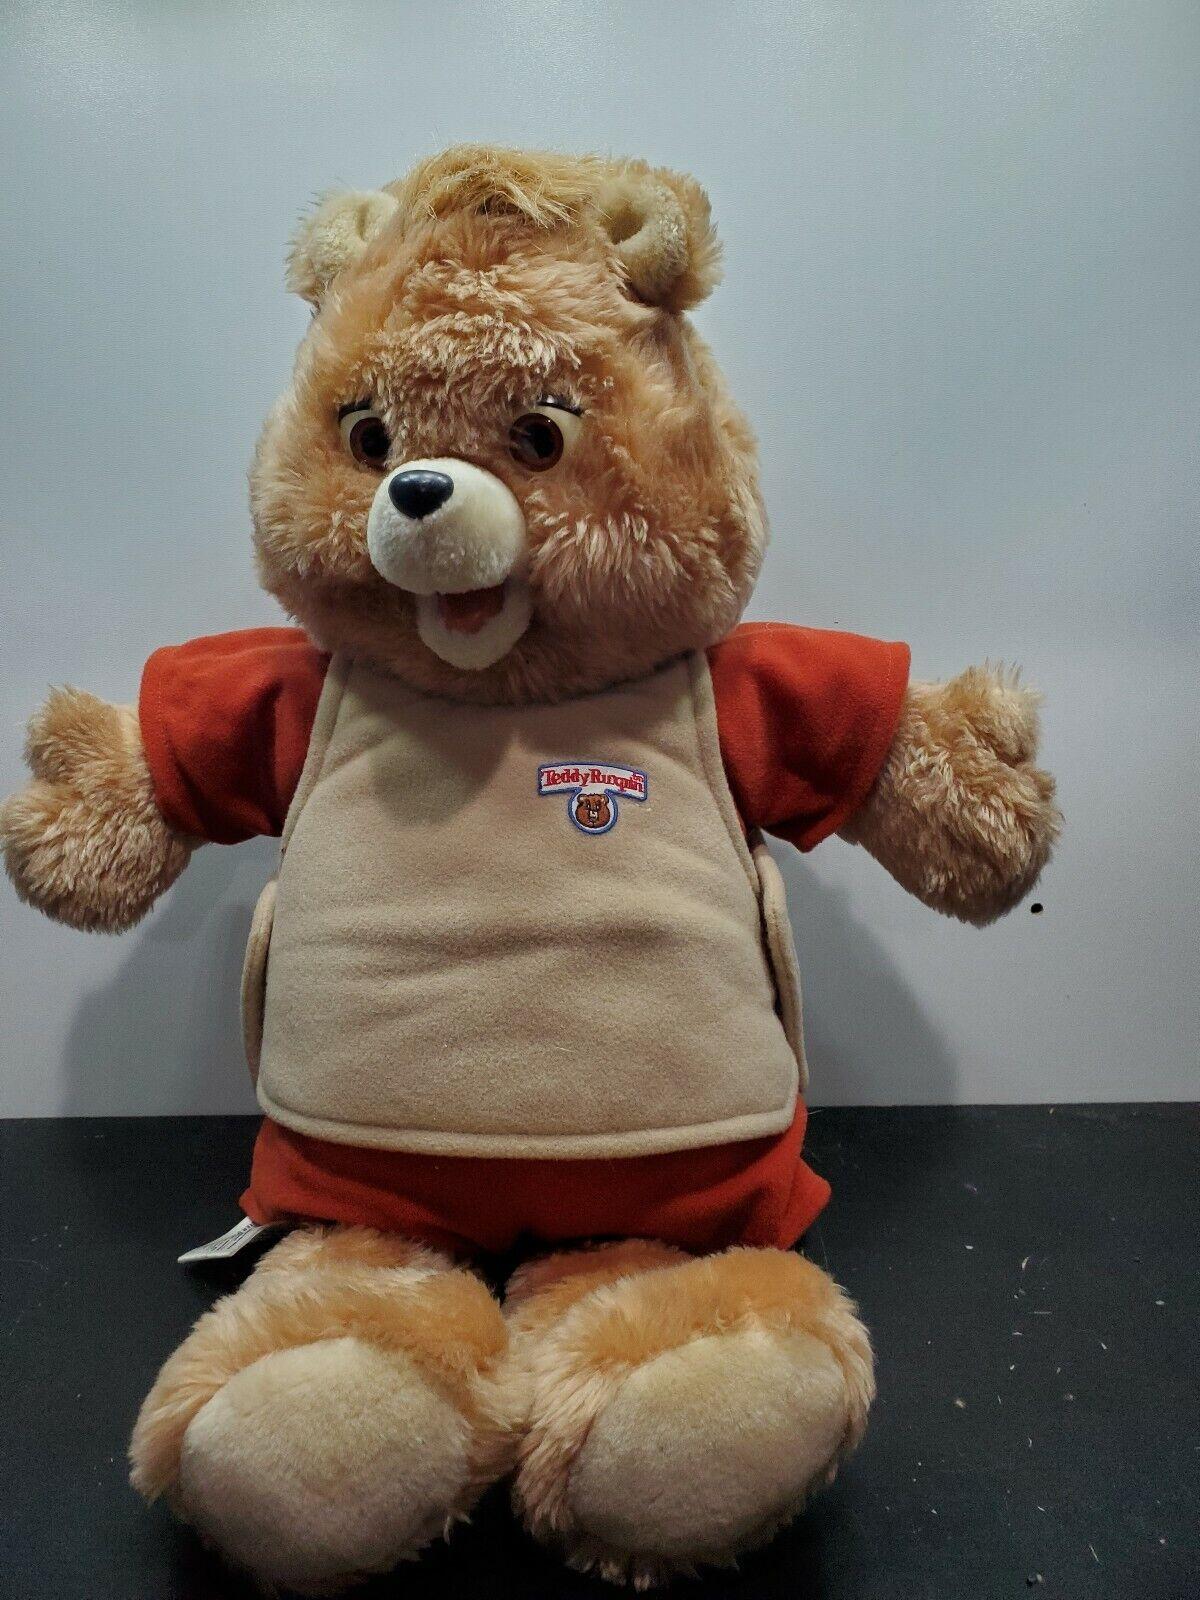 1984   1985 Teddy Ruxpin Talking Bear Plush Welts Of Wonder Spielzeug Music JAW BROKE